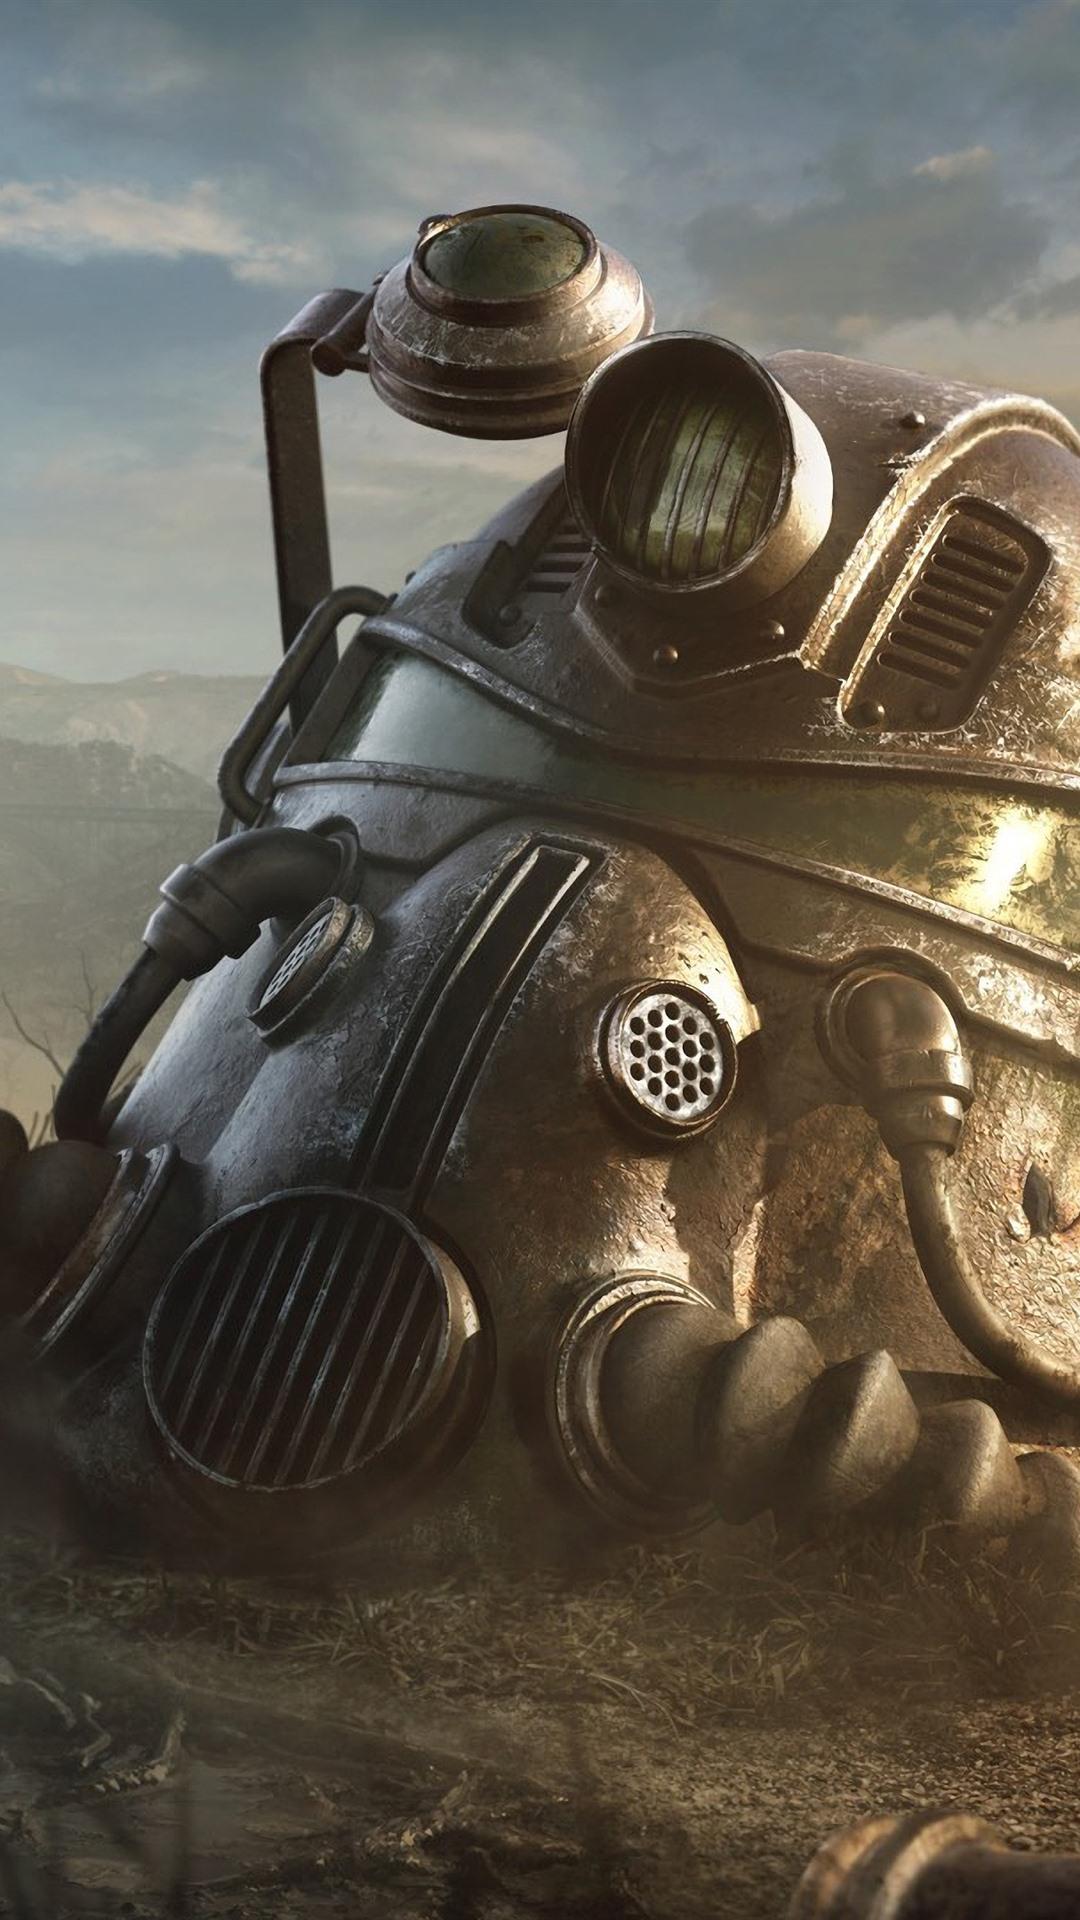 Fallout 4 Helmet 1080x1920 Iphone 8 7 6 6s Plus Wallpaper